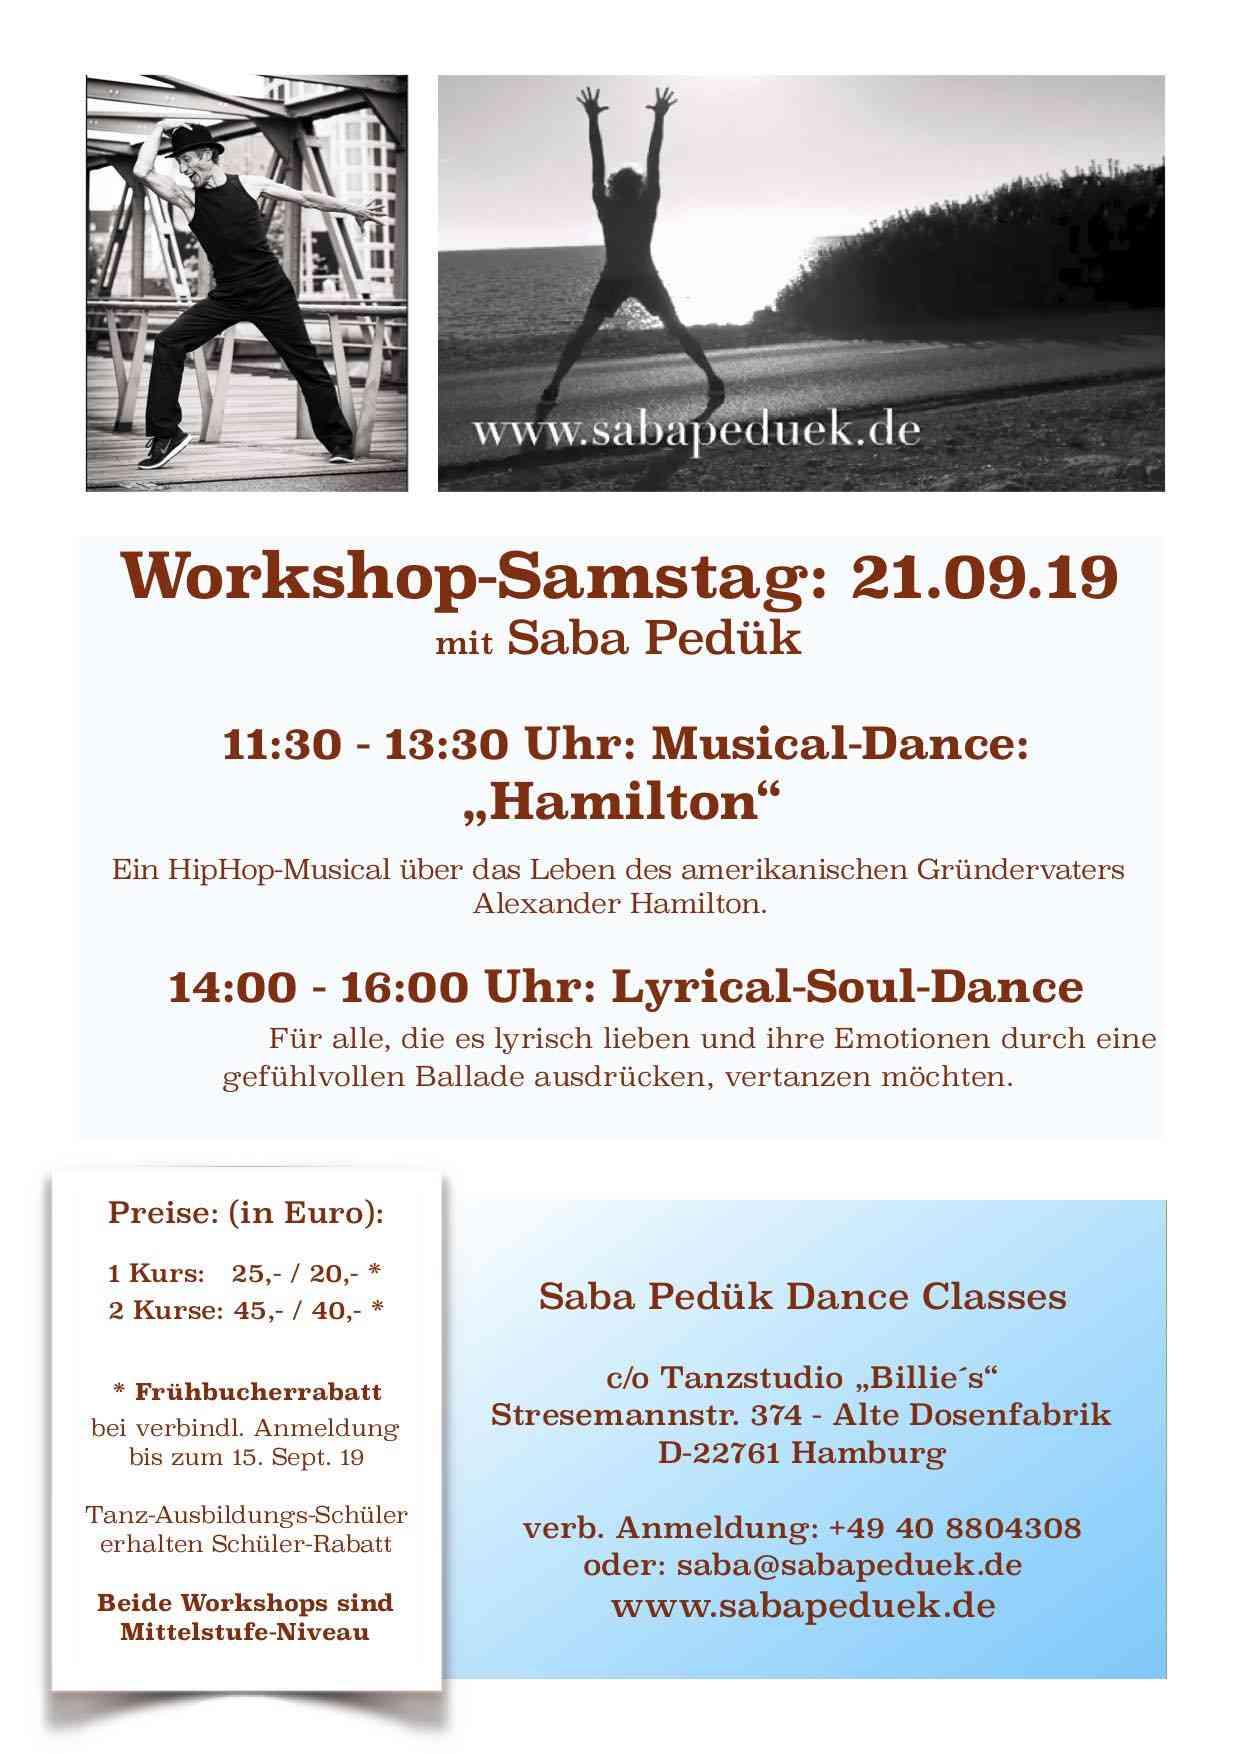 workshop_samstag_sabapeduek.de